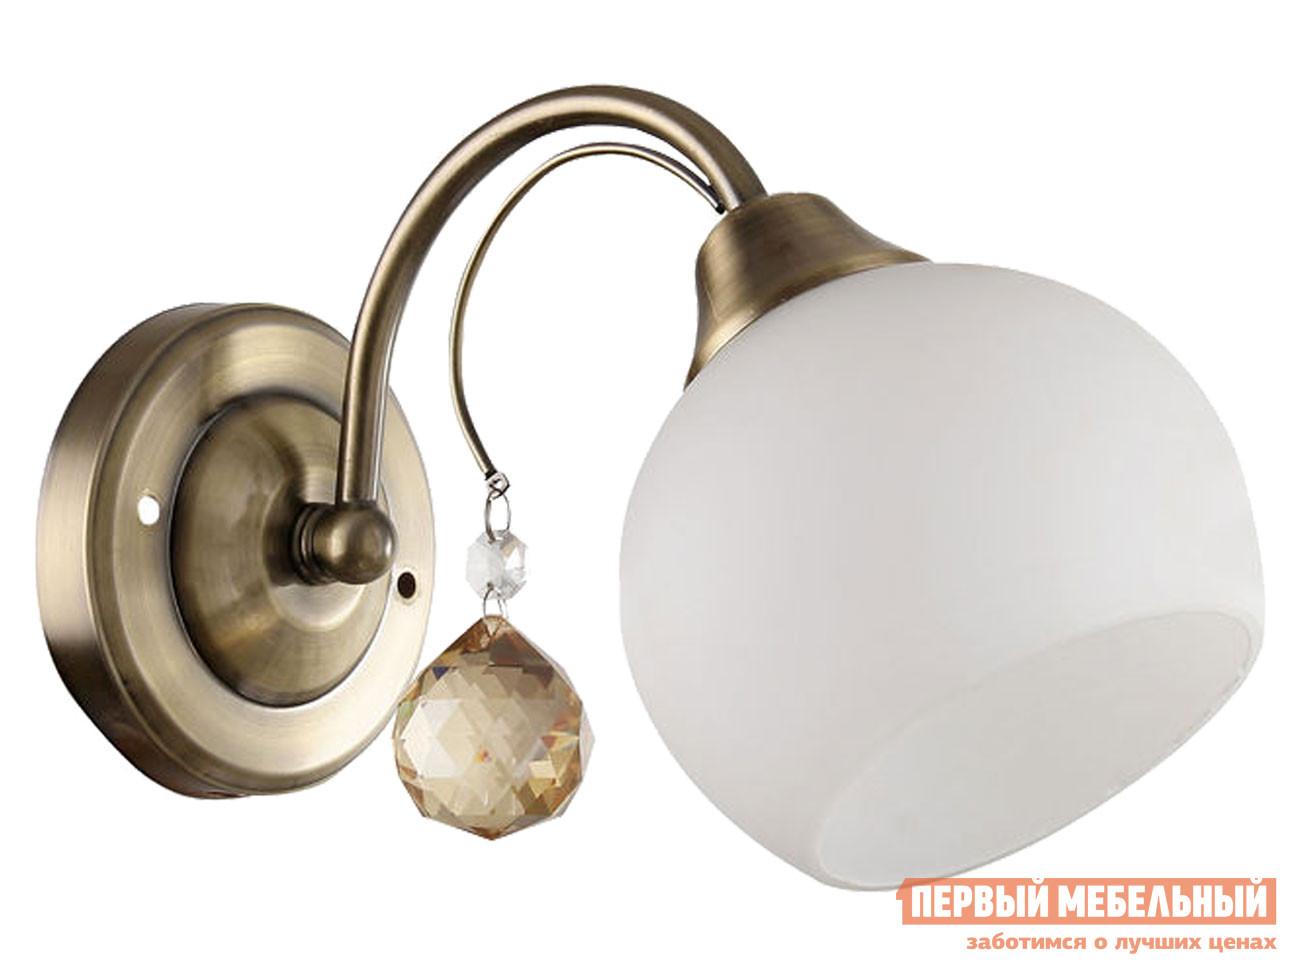 Бра  MD.11419-1-W AB 1*60Вт E27 Античная бронза / Белый Электросвет 124164